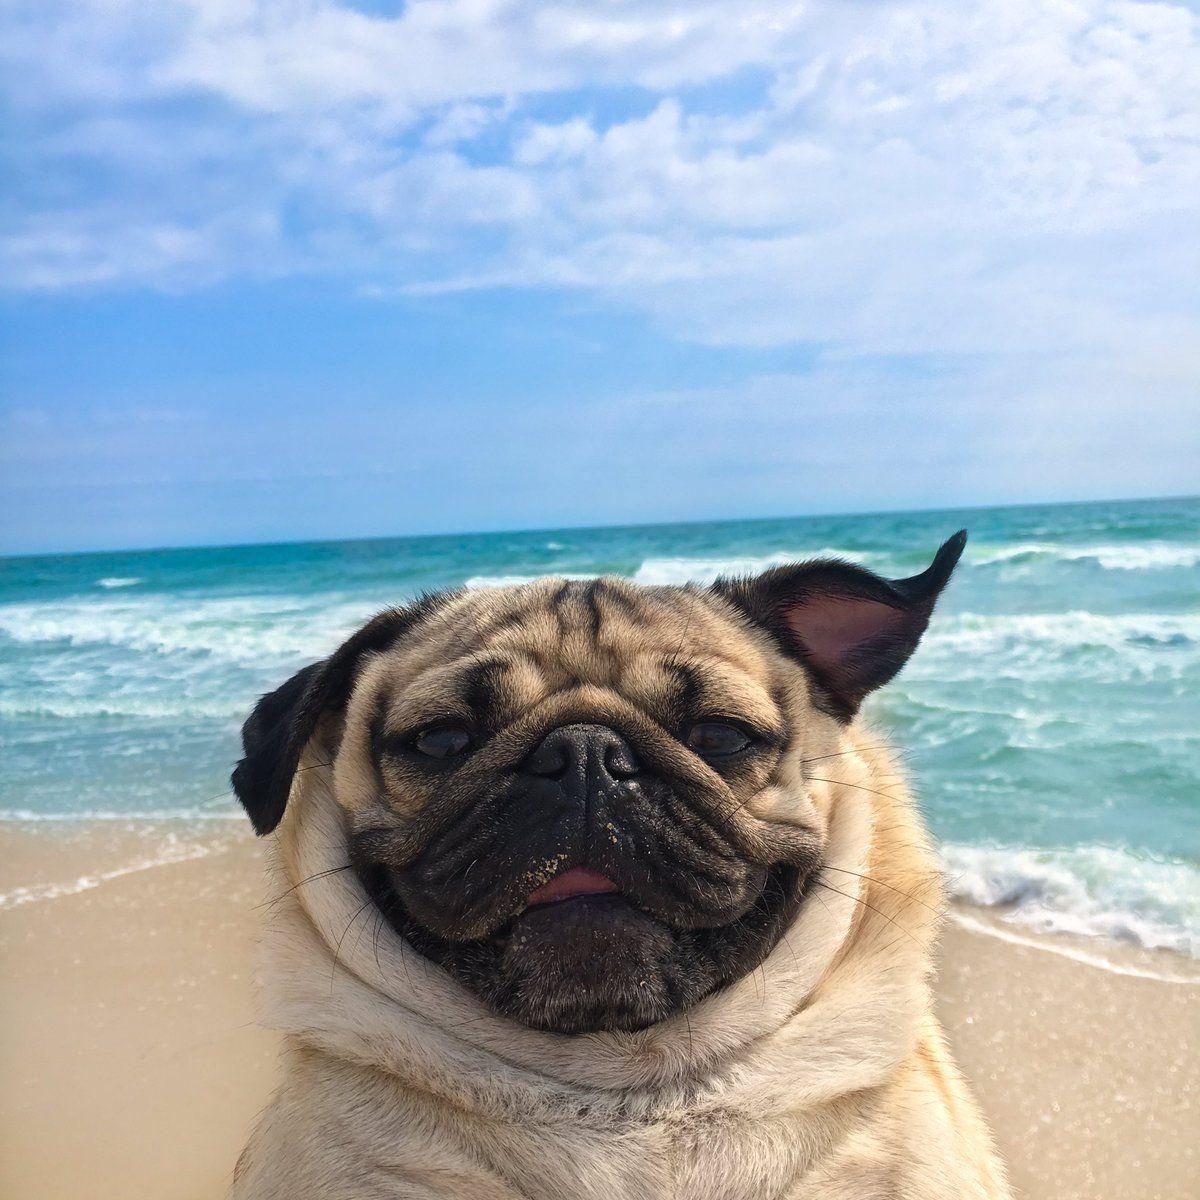 1 Doug The Pug Itsdougthepug Twitter Pug Dog Pugs Funny